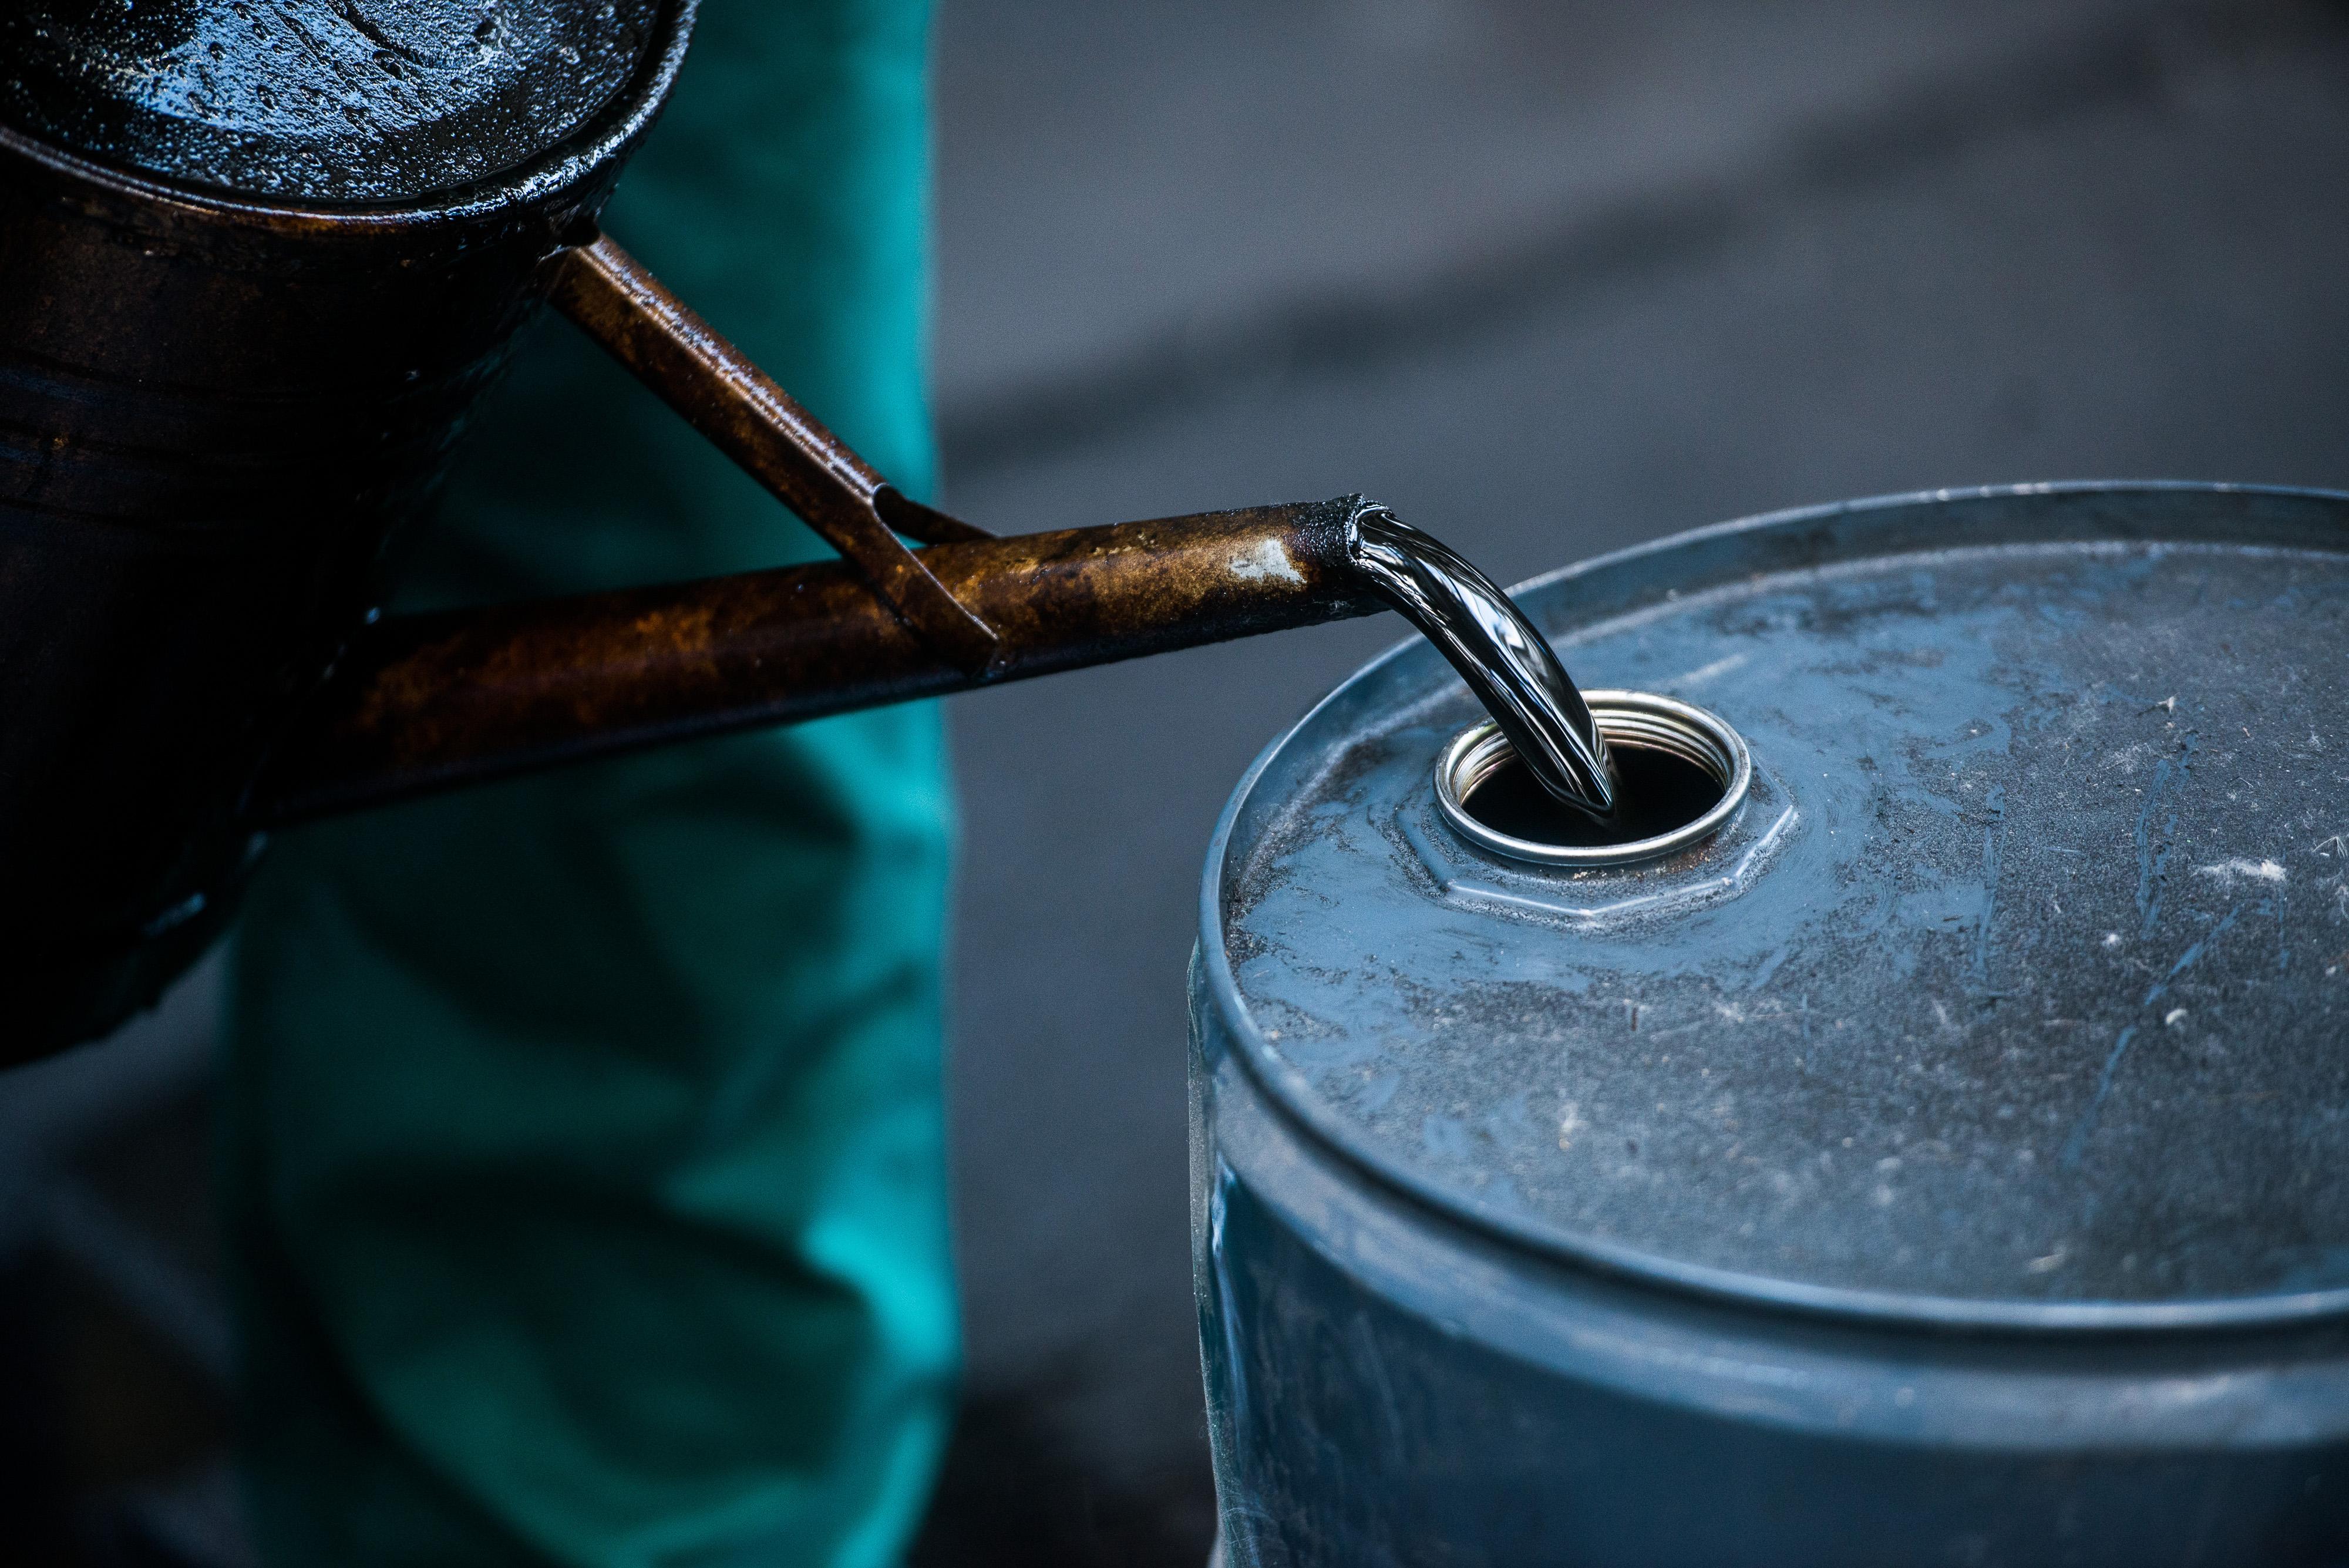 A worker pours liquid oil into a barrel.